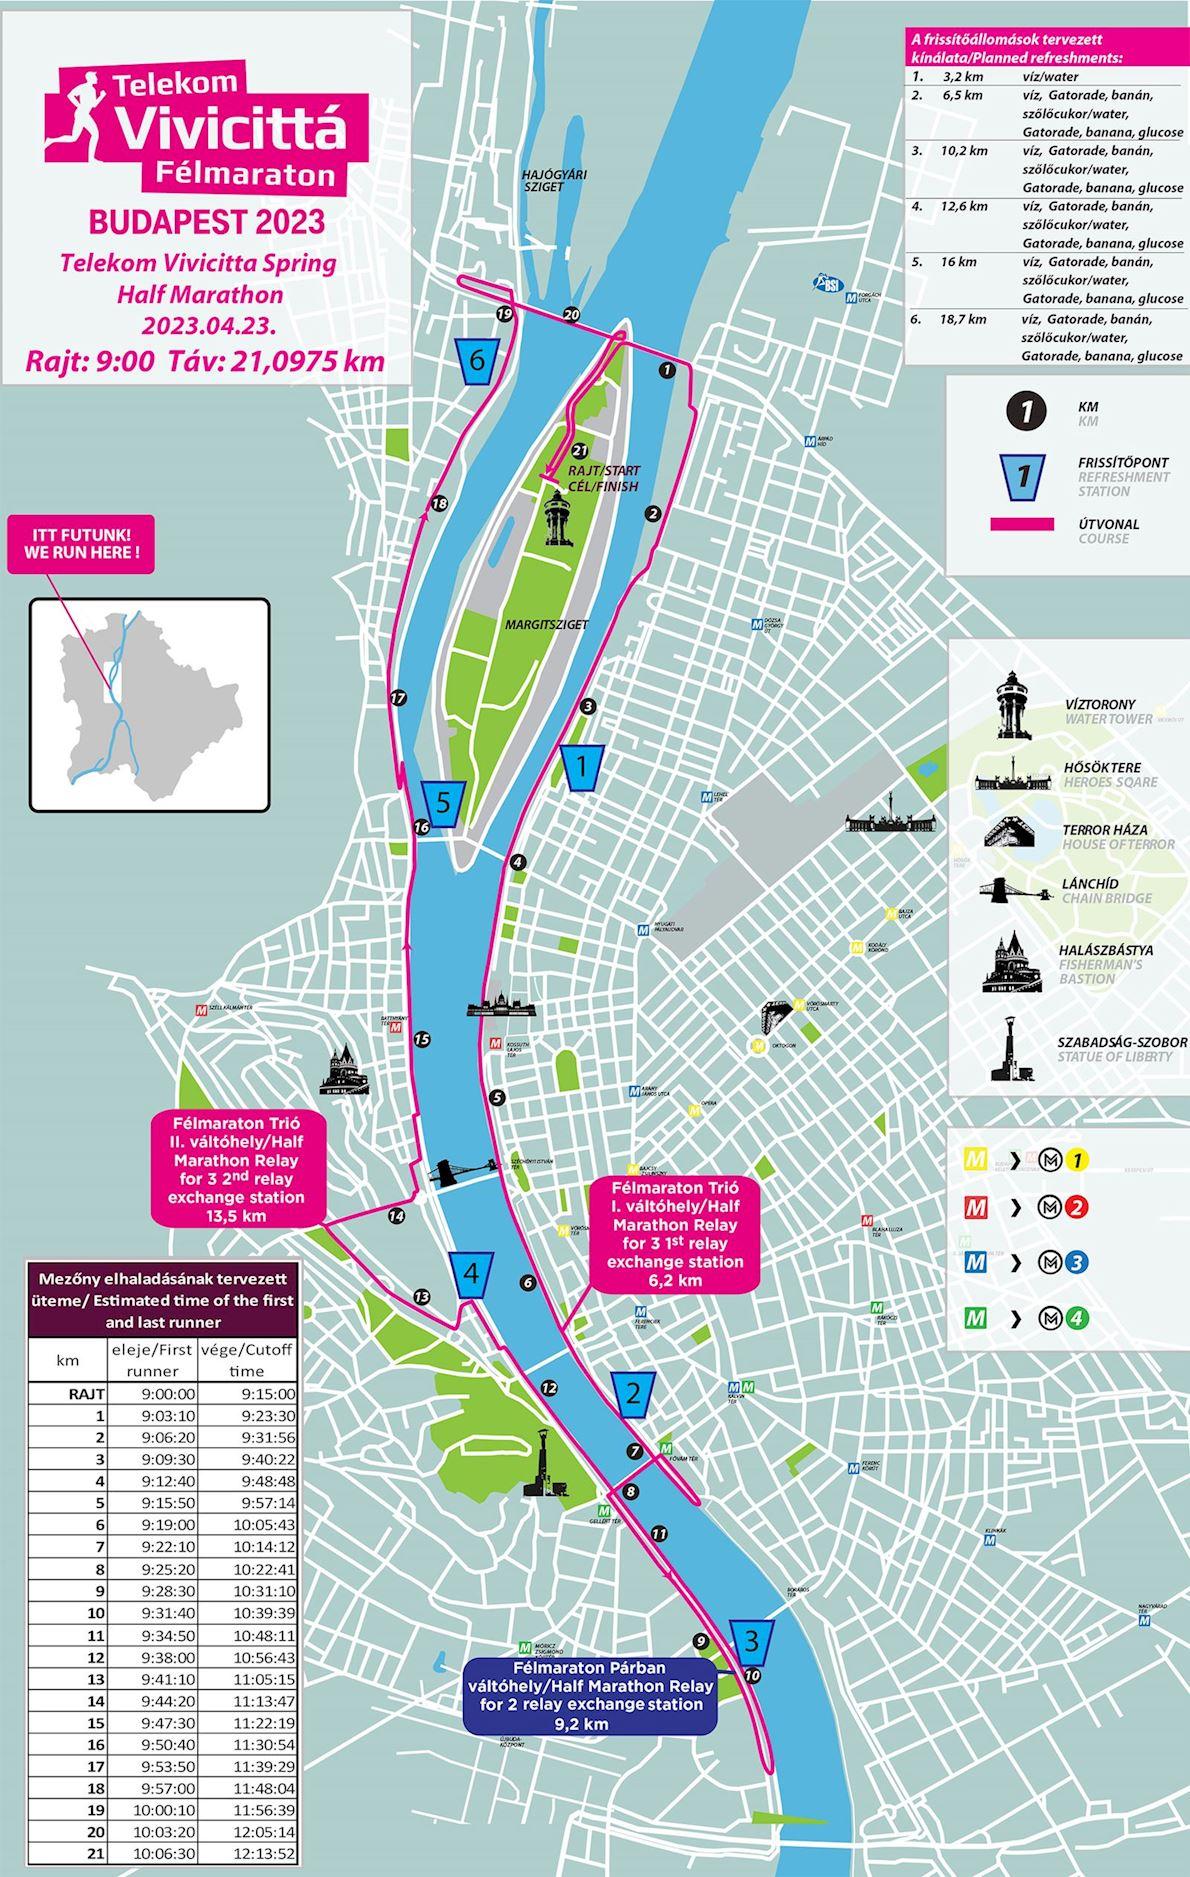 Telekom Vivicitta Budapest Spring Half Marathon Route Map